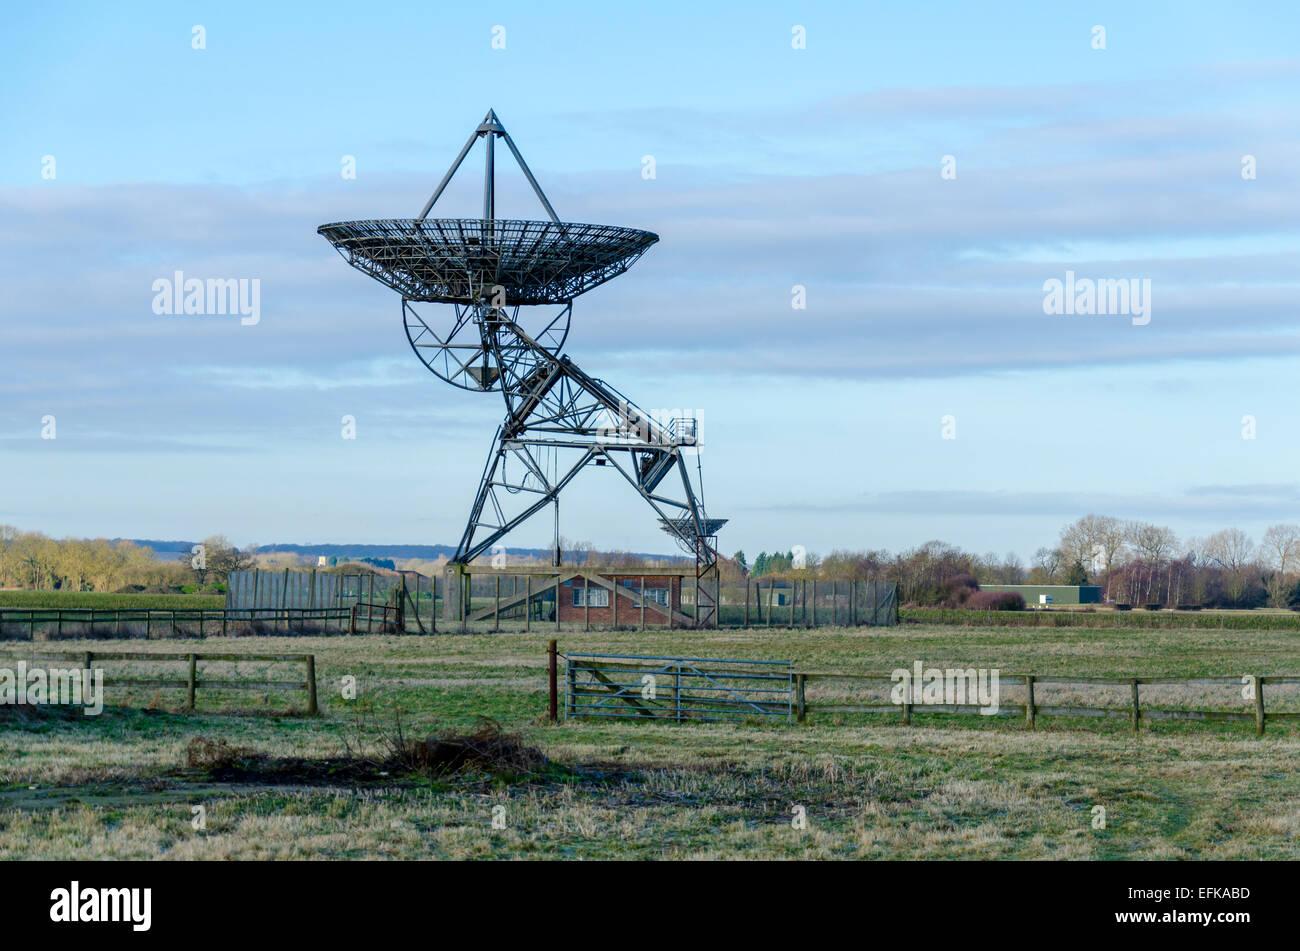 One antenna of the One-Mile Telescope at Mullard Radio Astronomy Observatory radio telescopes, Cambridge - Stock Image